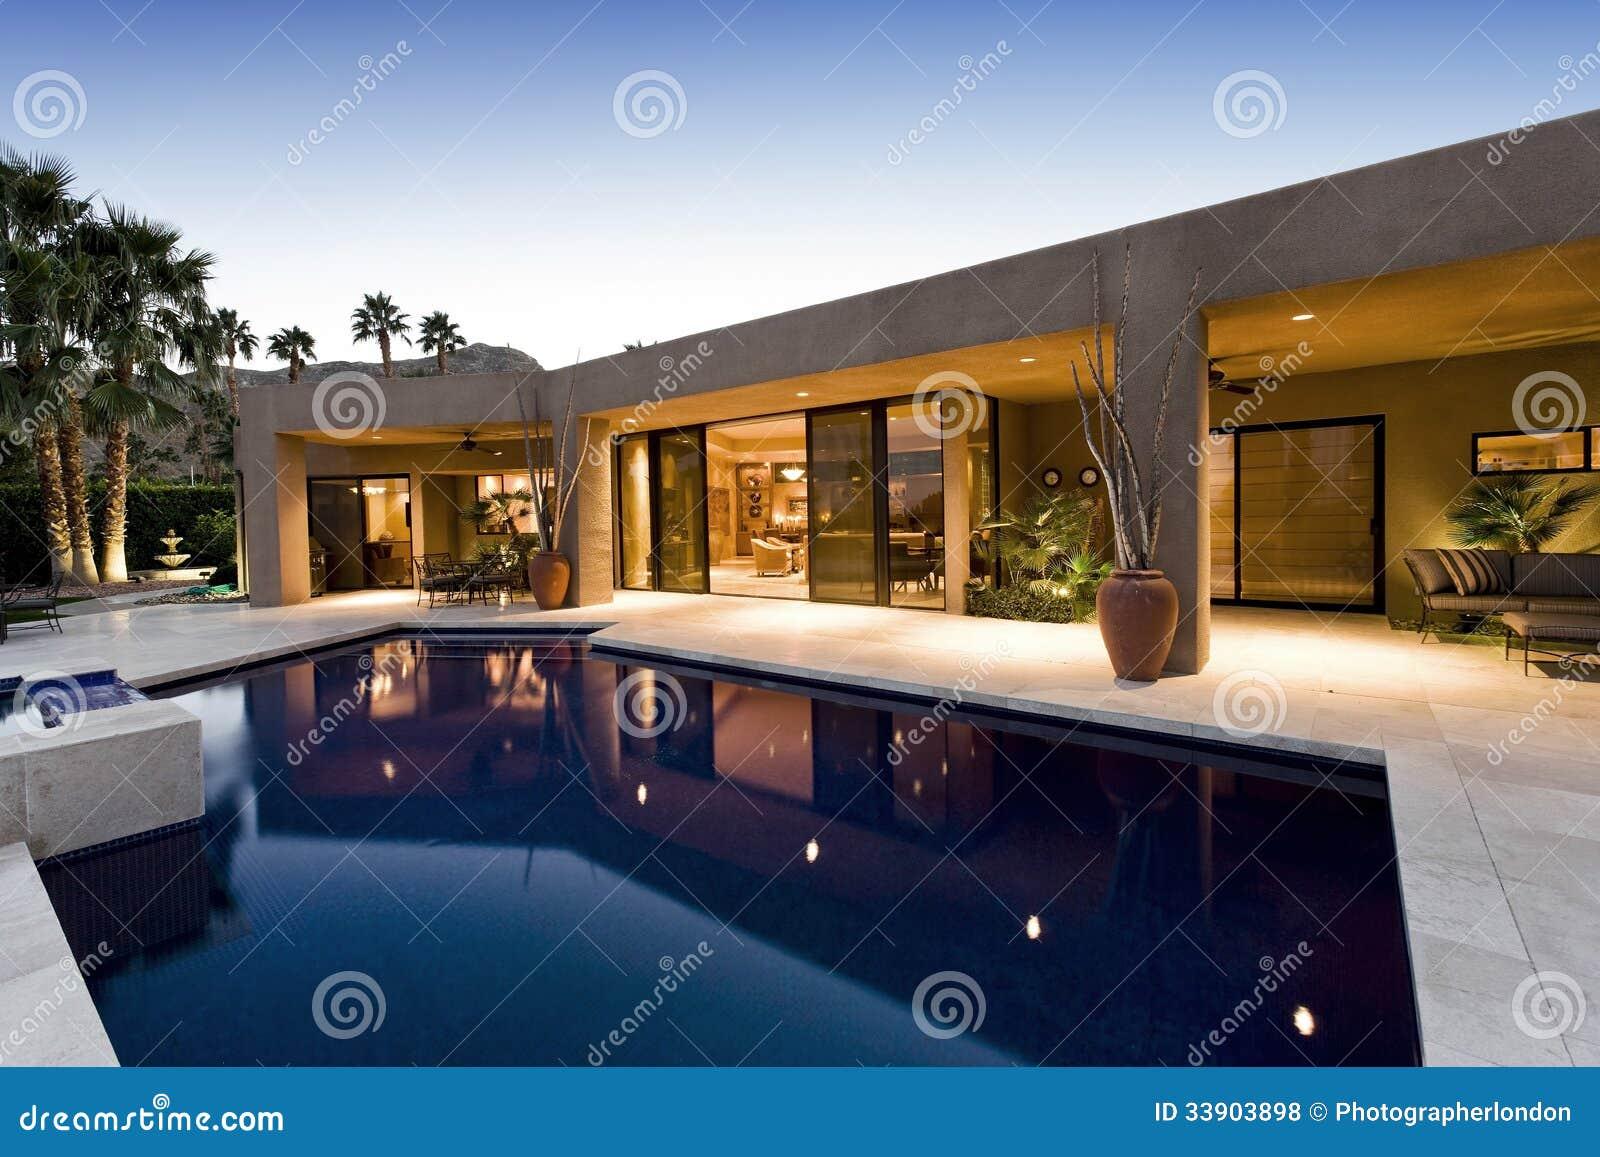 Swimmingpool gegen modernes Haus